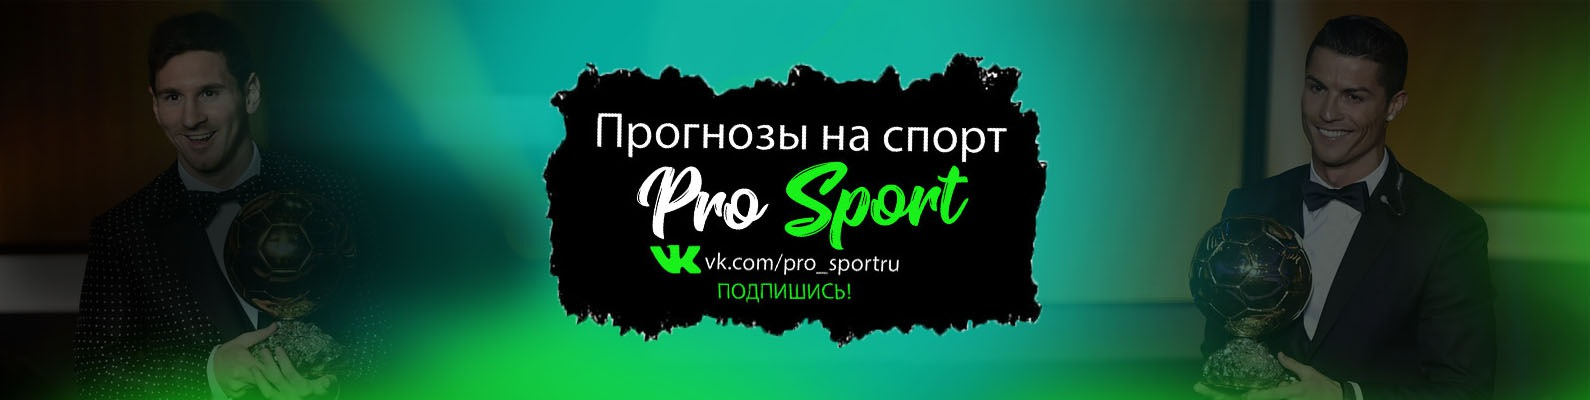 прогнозы на спорт 31012018